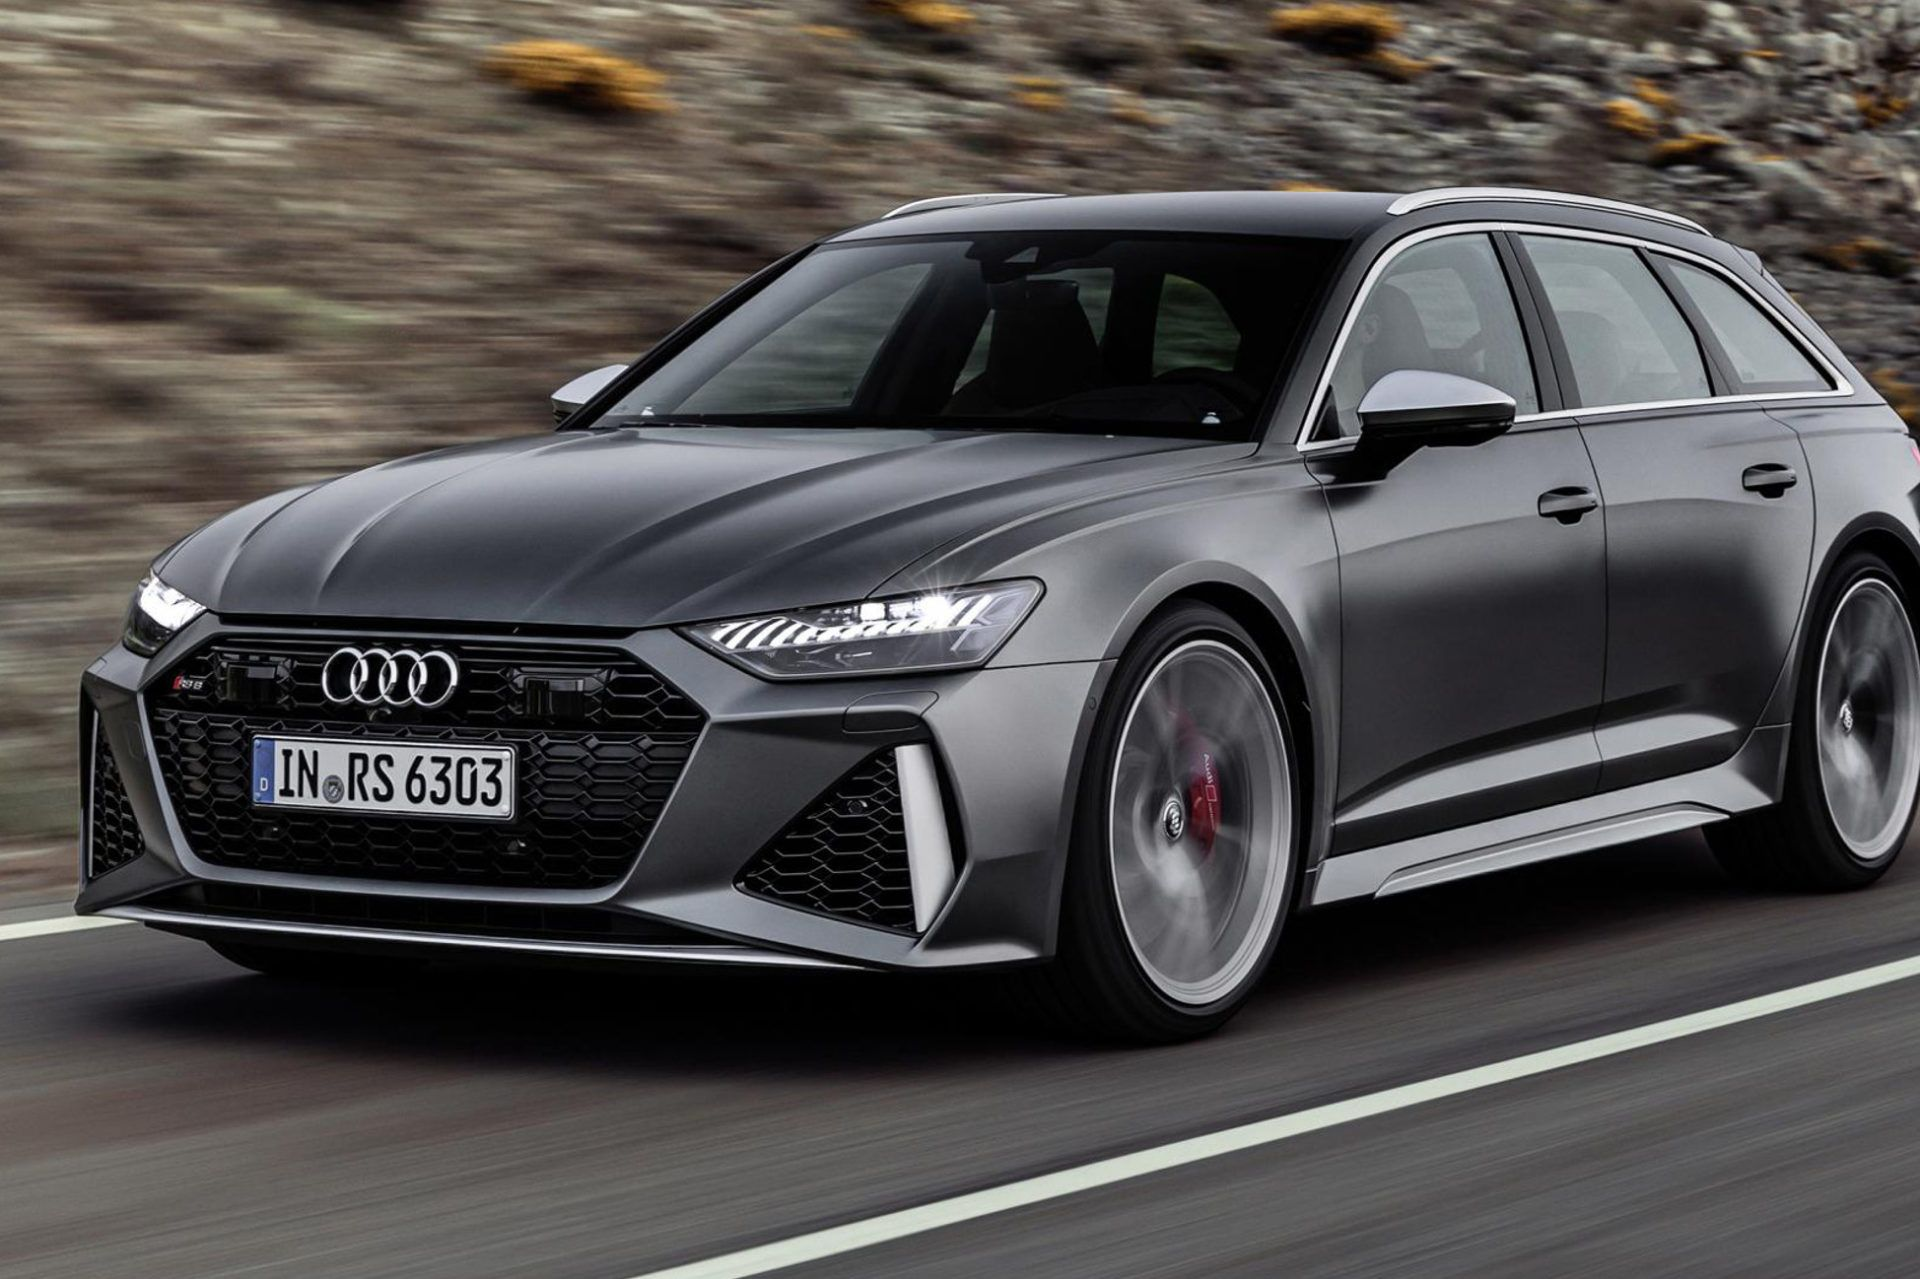 2020 Audi Rs6 Avant Coming To United States Audi Porsche Panamera Modellen